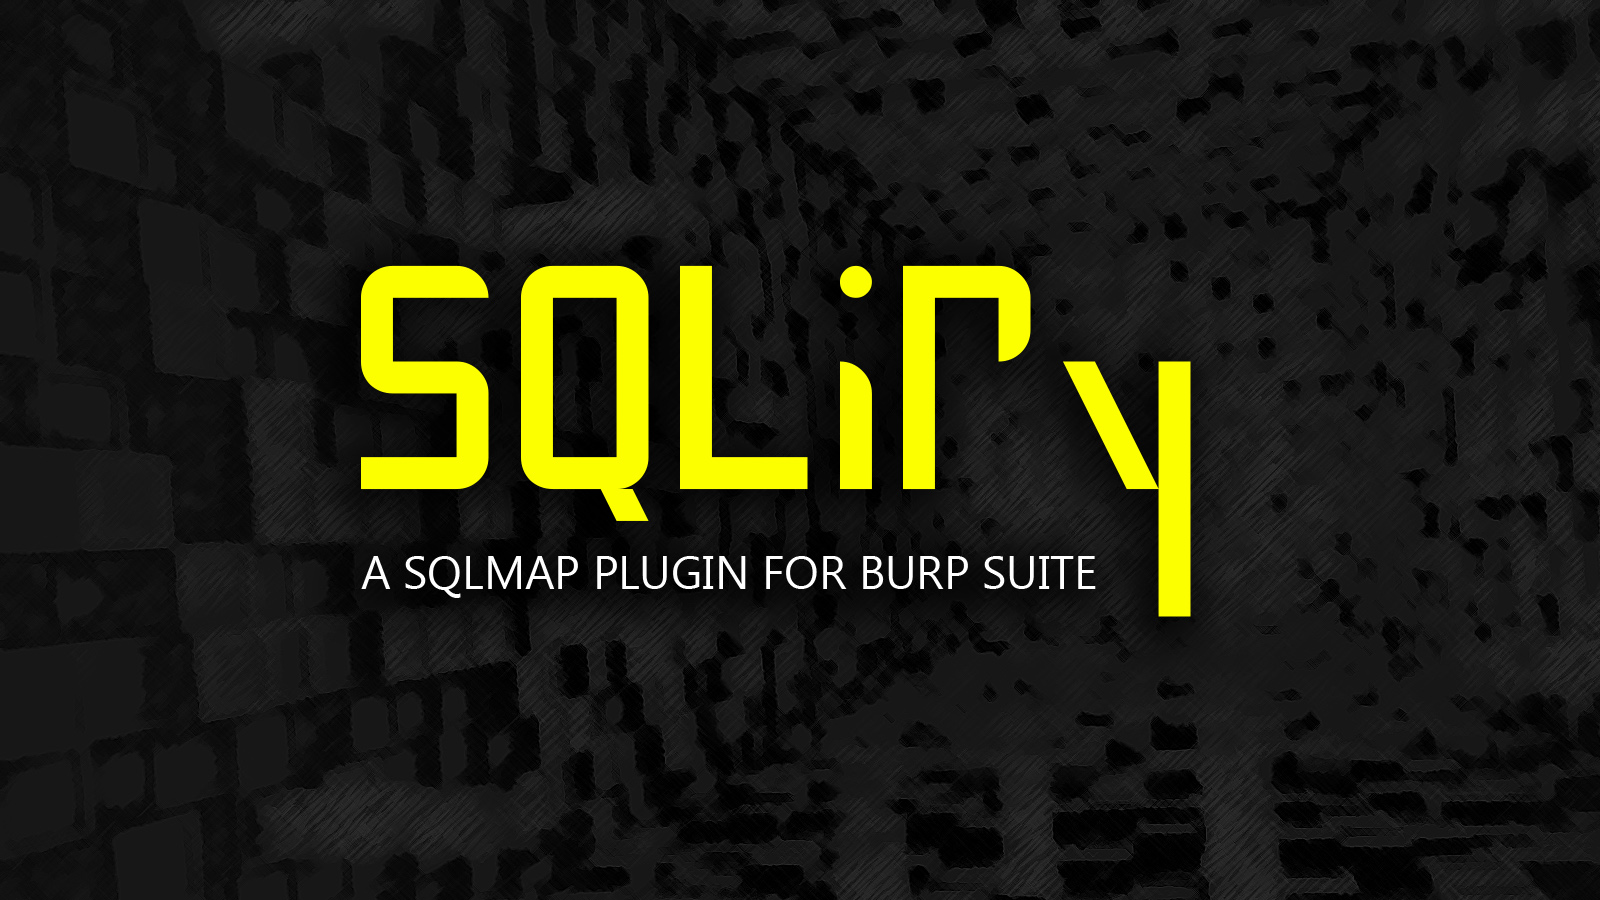 SQLiPy - A SQLMap Plugin for Burp Suite